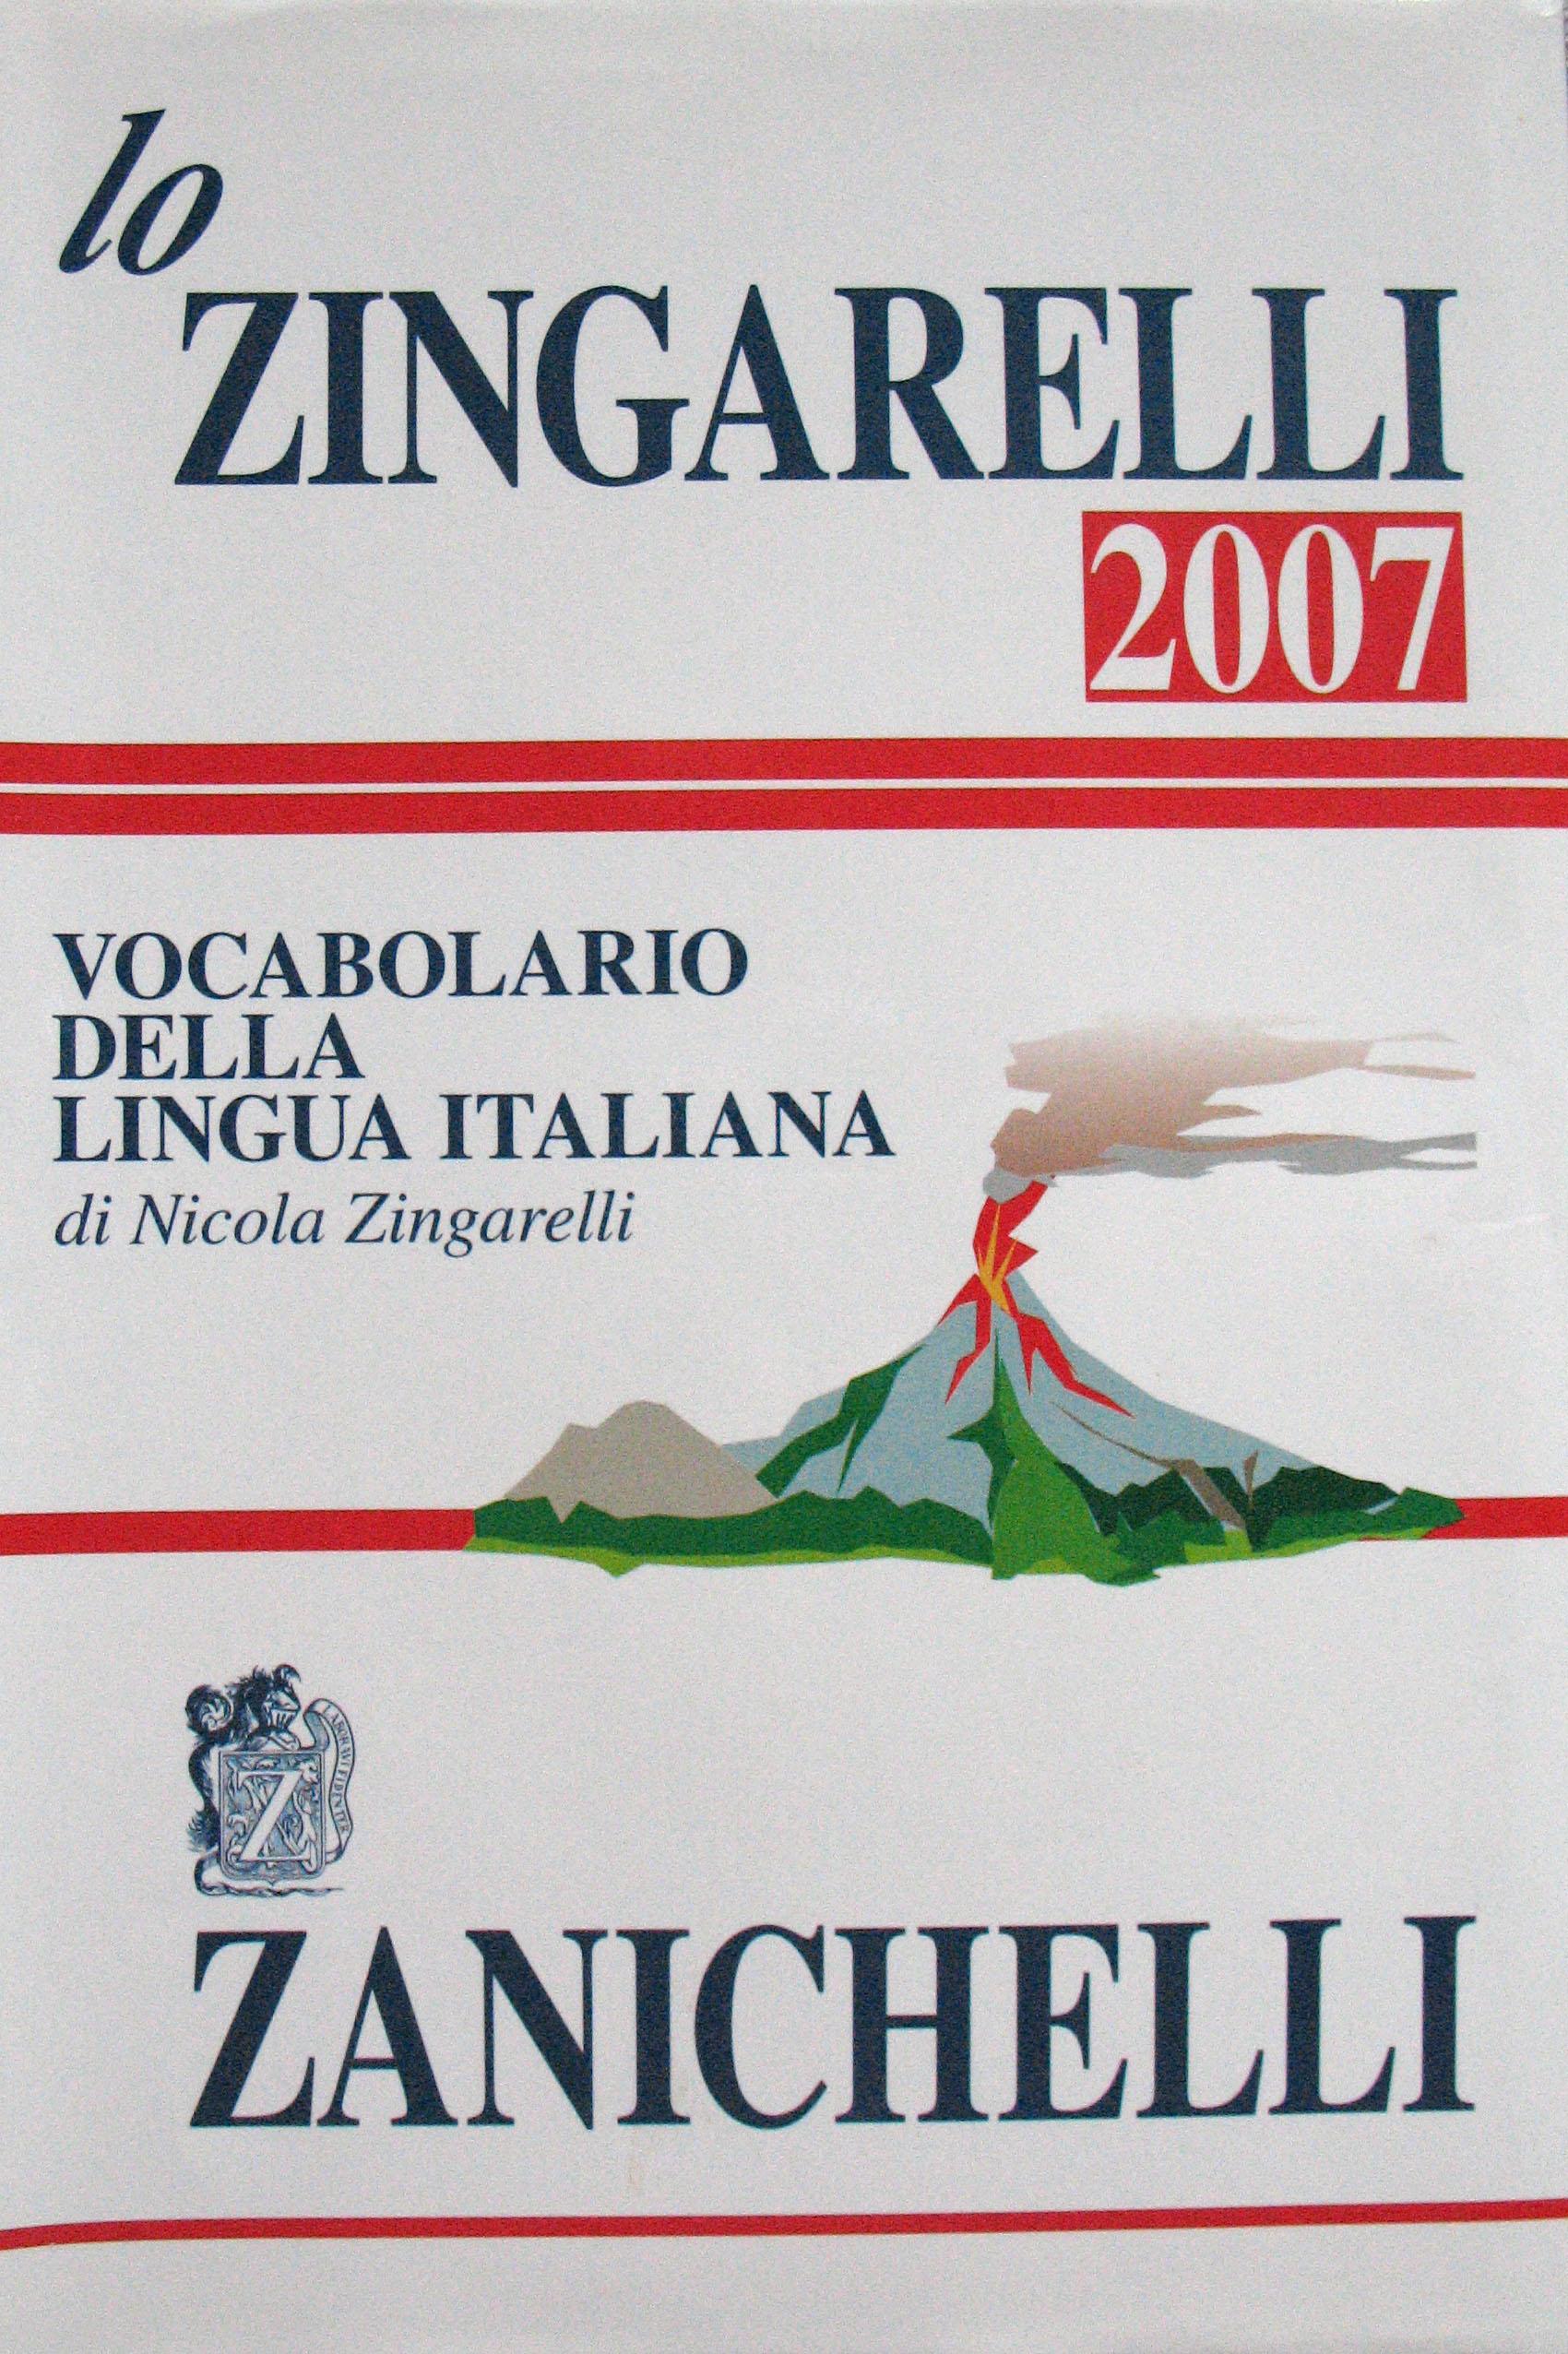 Lo Zingarelli 2007